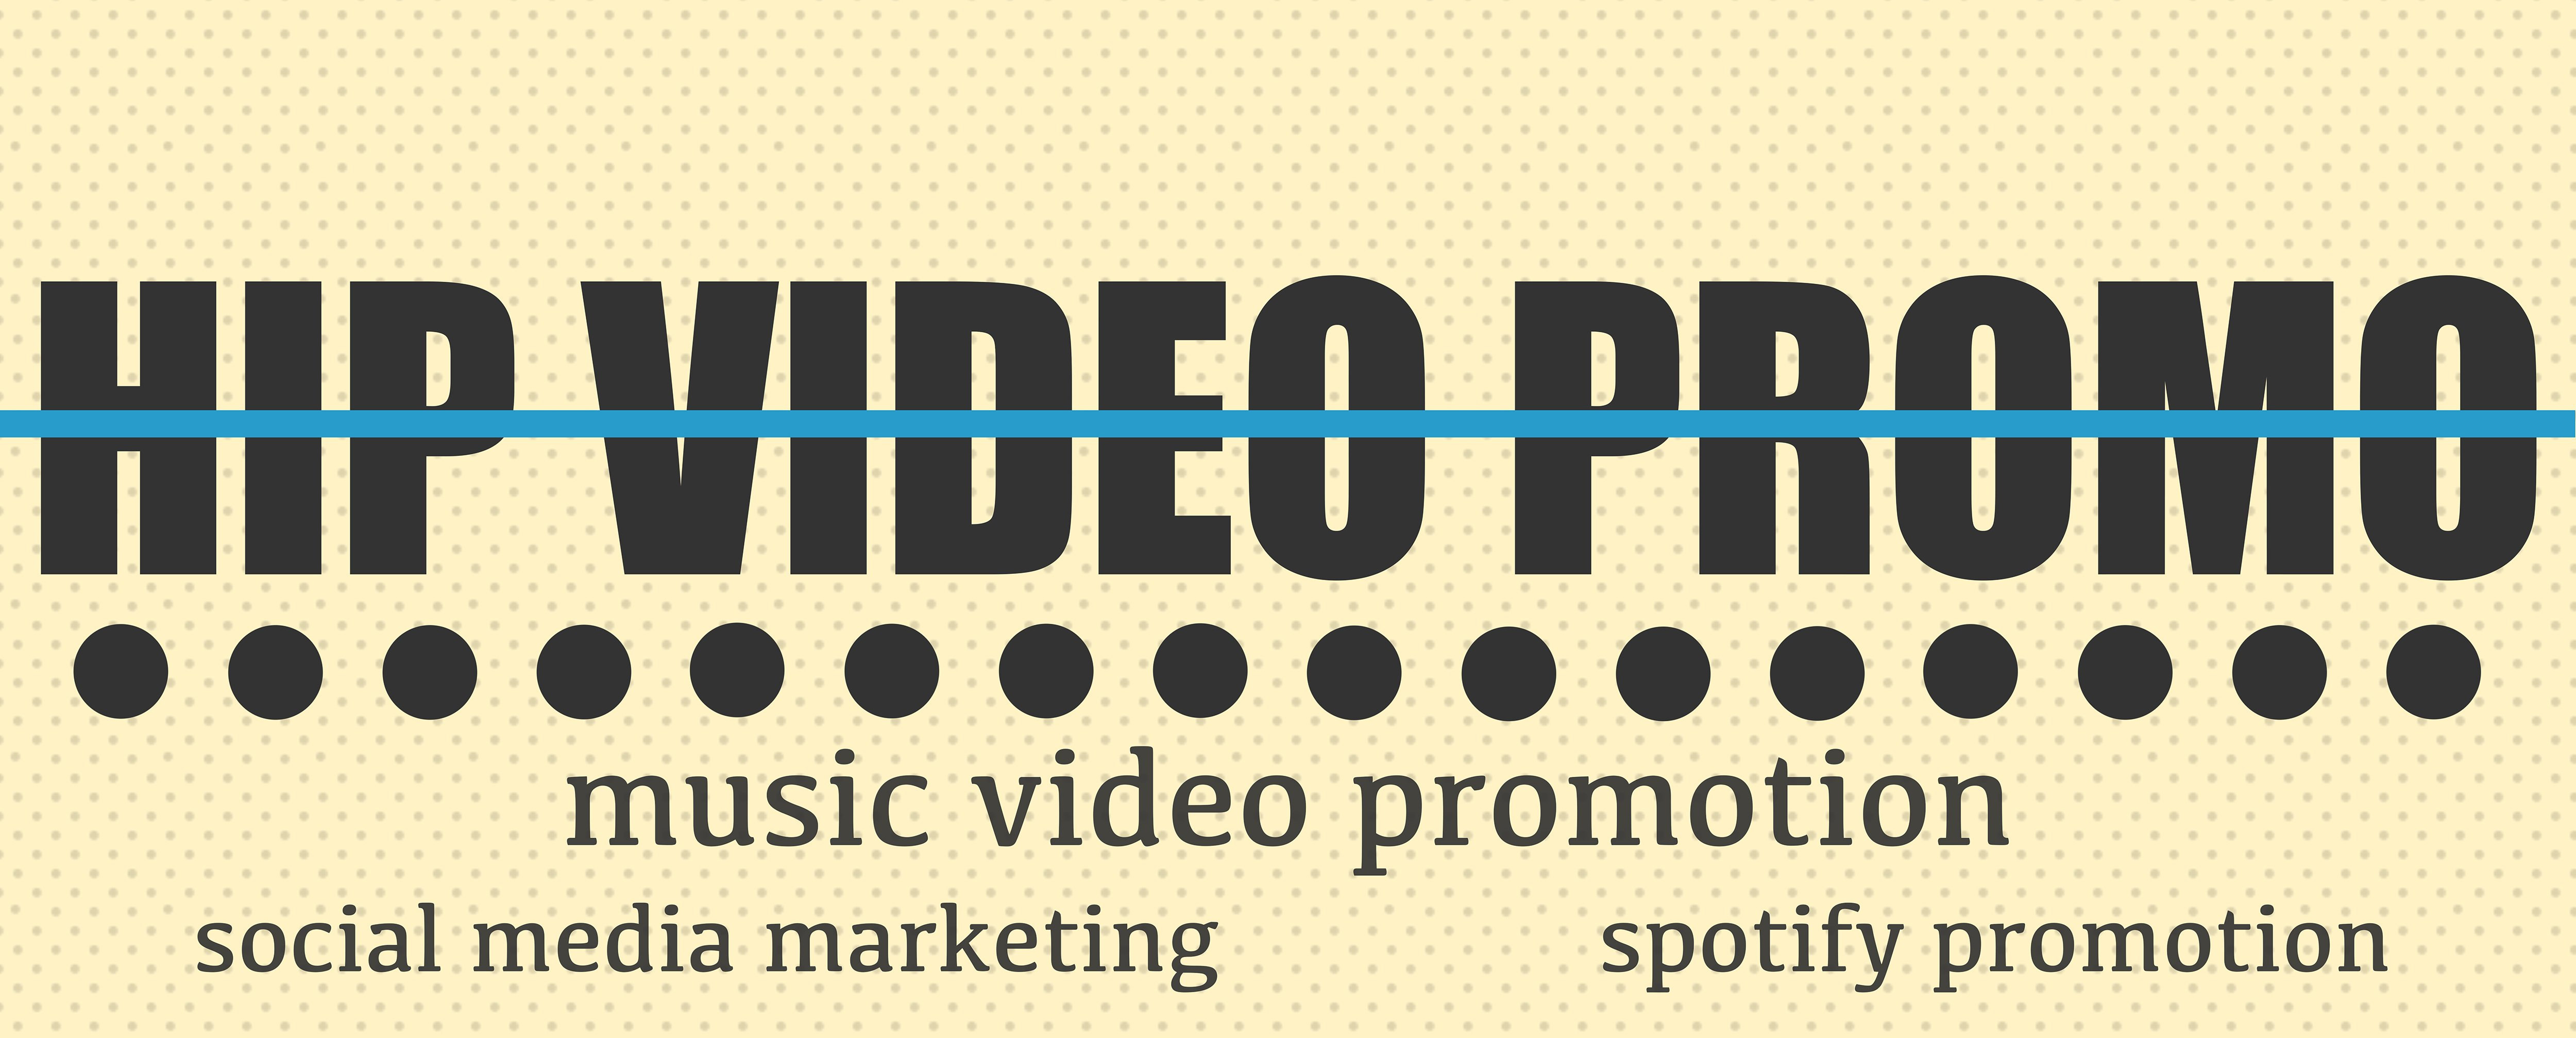 HIPVideoPromo_sample_newbanner-2019_spotify